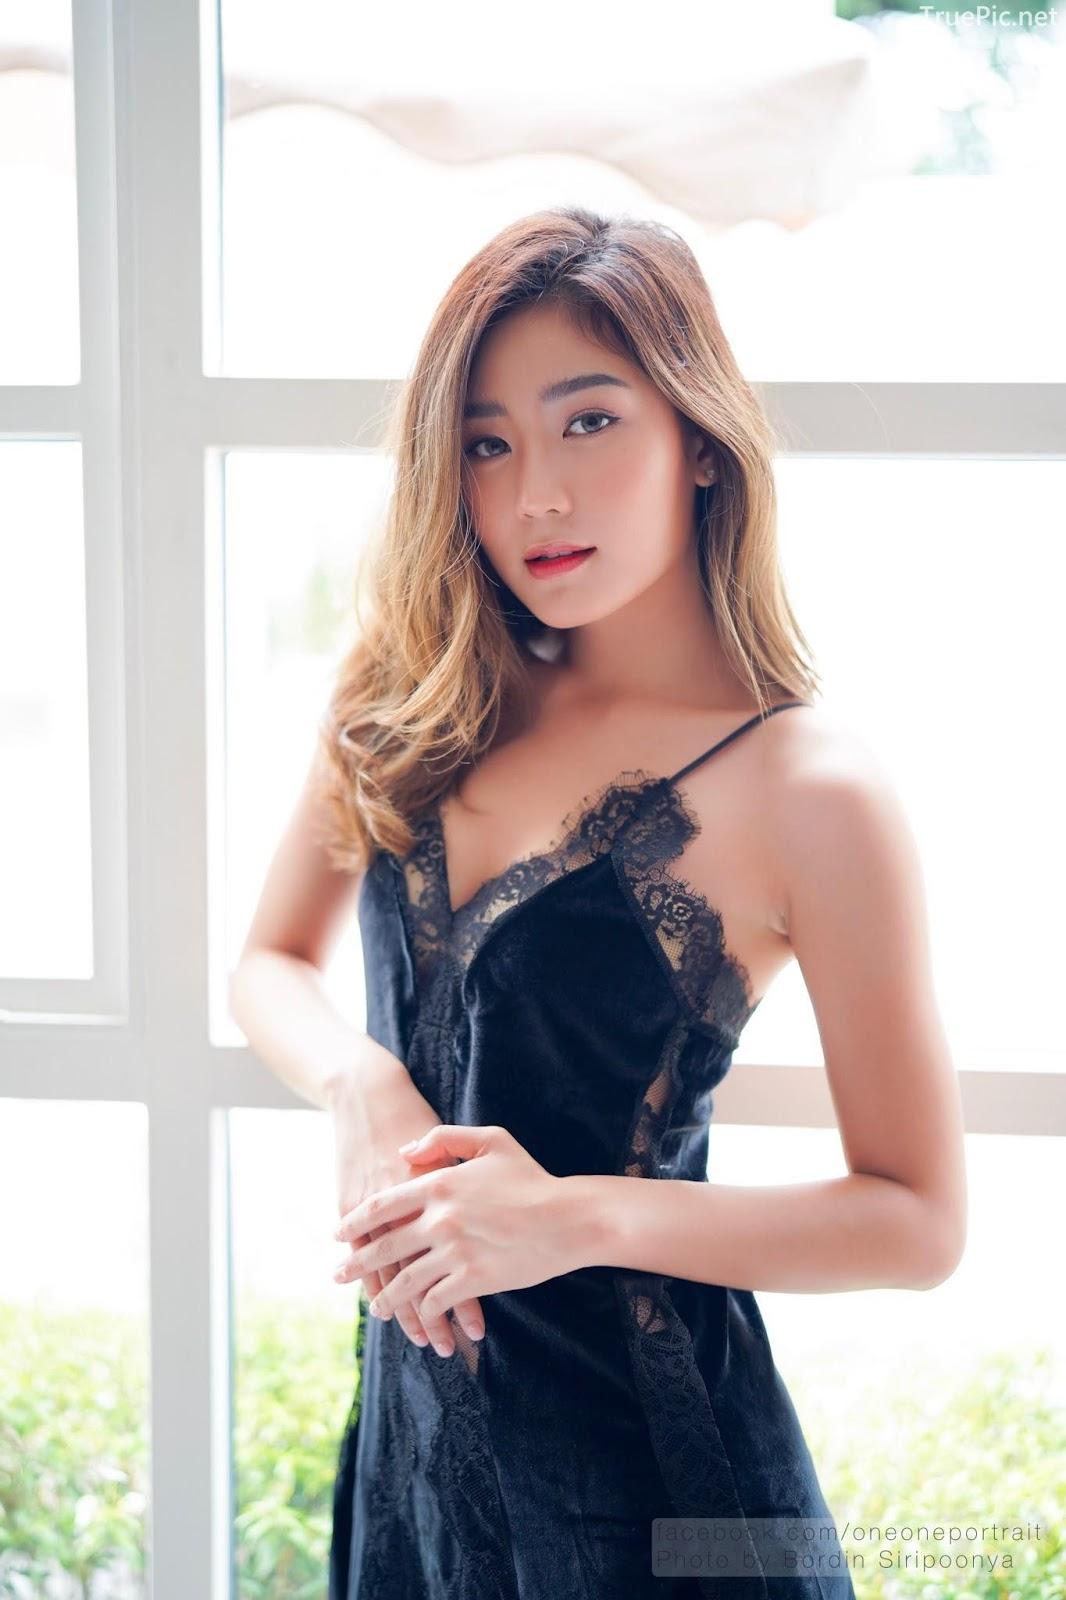 Thailand hot model Pattaravadee Boonmeesup vs Photo album Black Magic Sleepwear - Picture 2